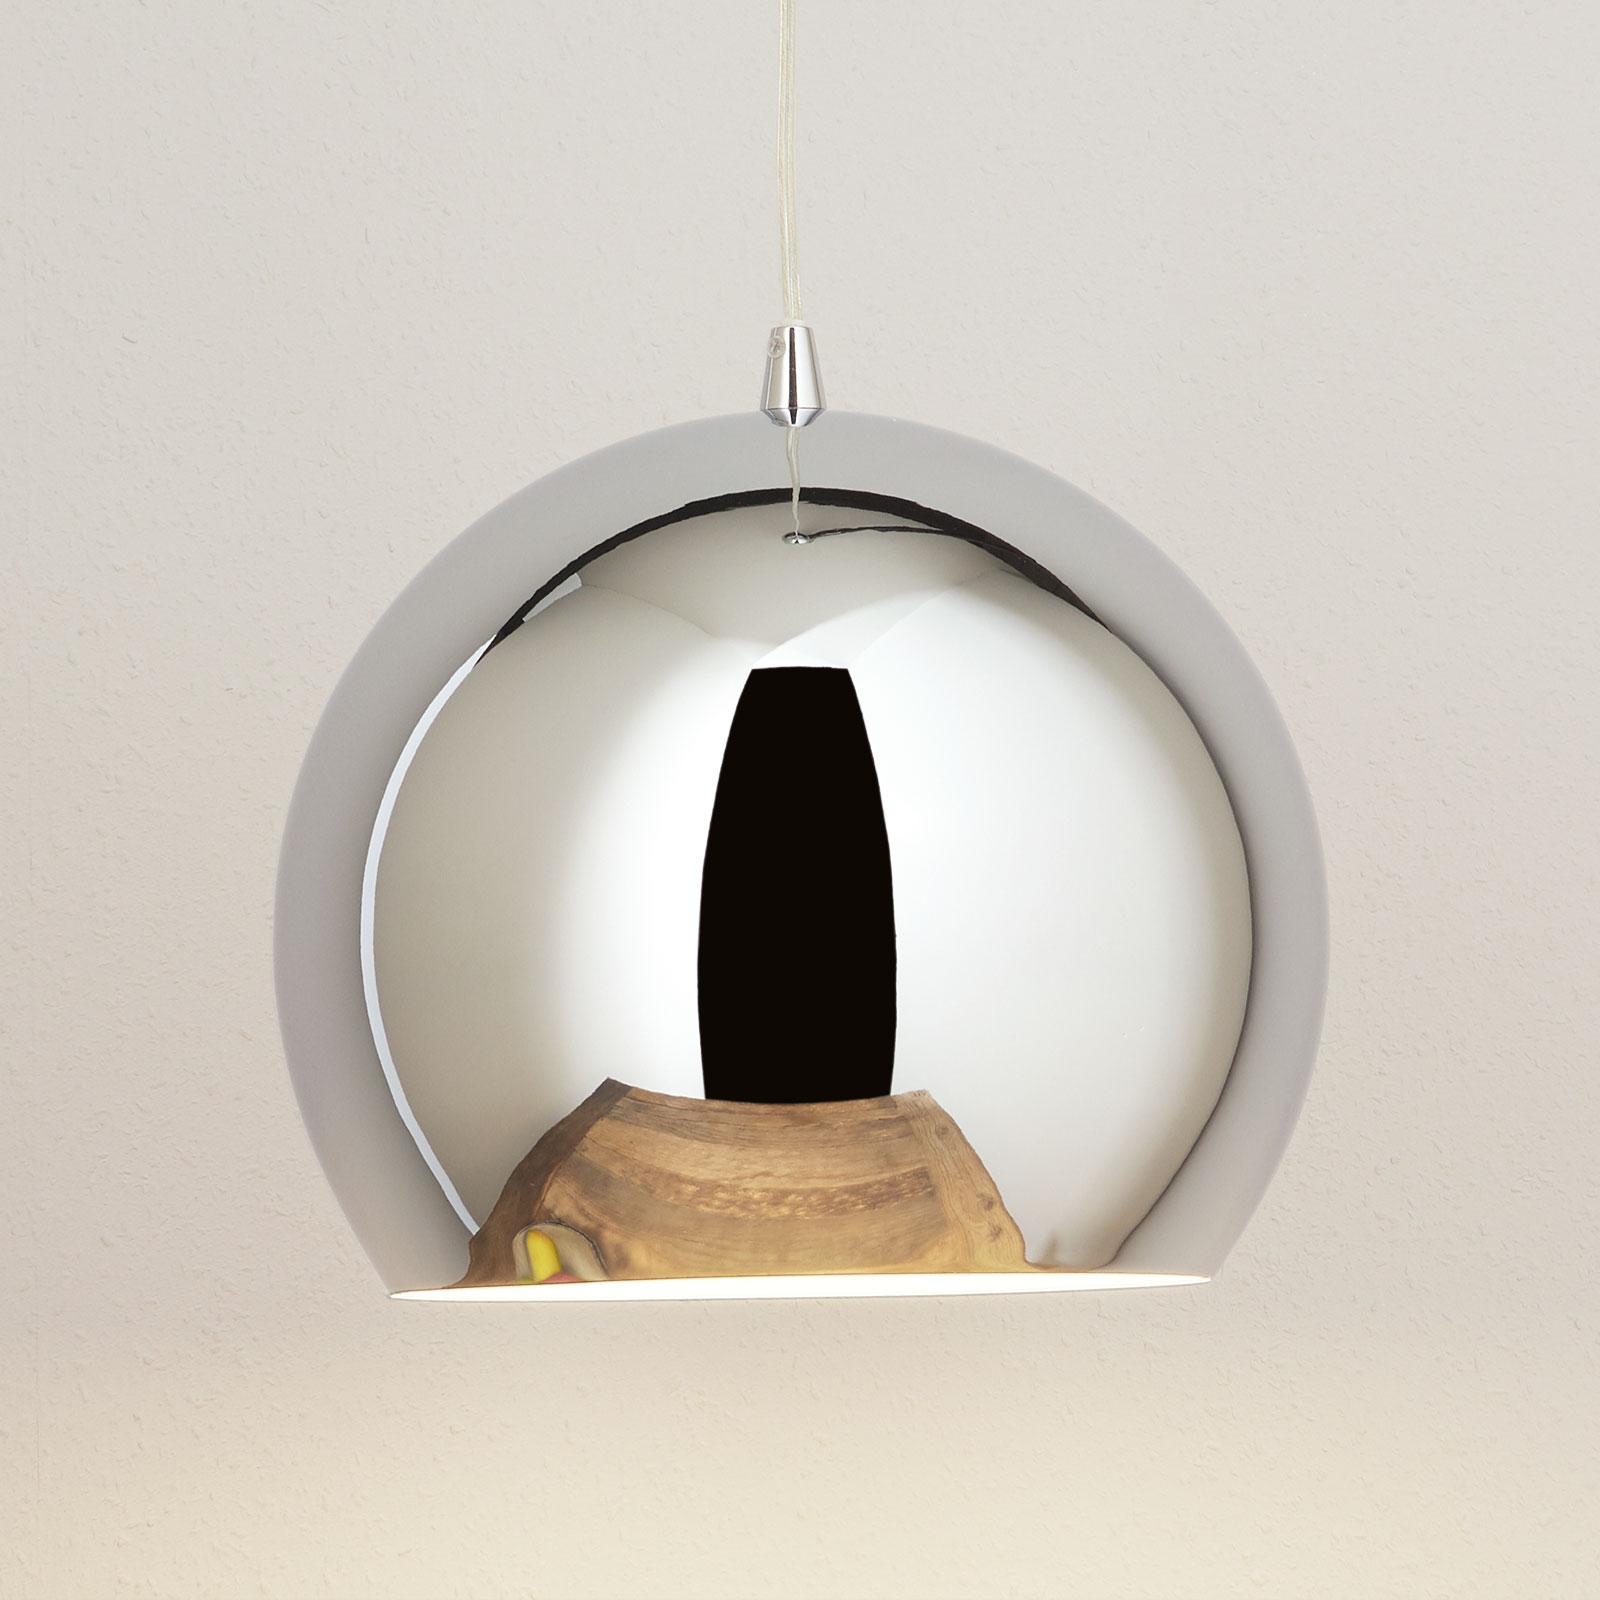 Závesná lampa Bulle chróm_1065018_1